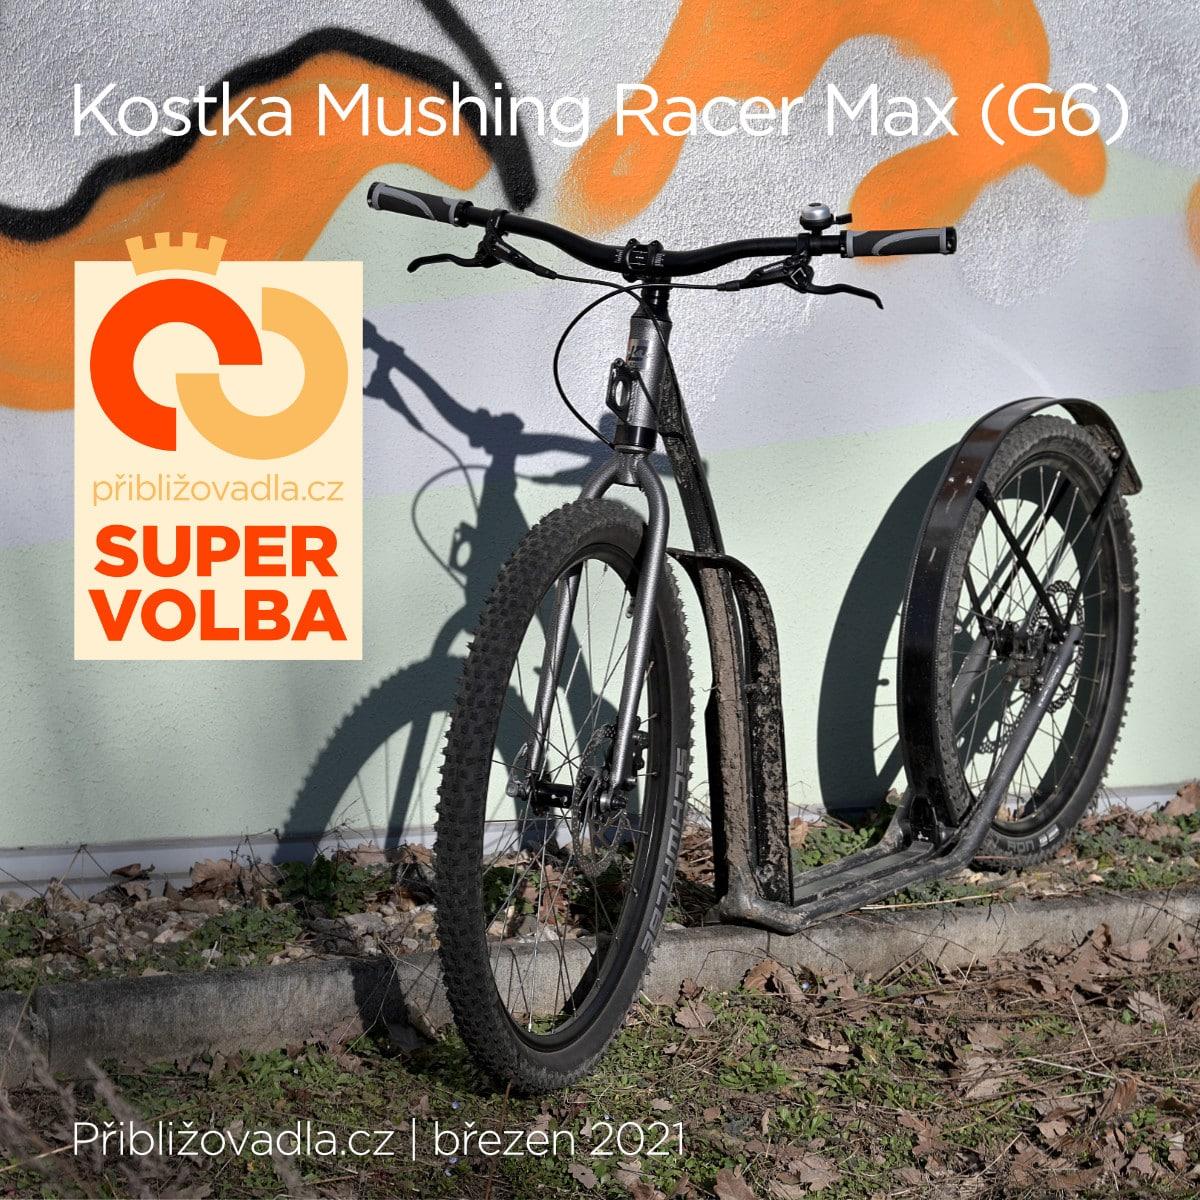 Kostka Mushing Racer Max (G6)